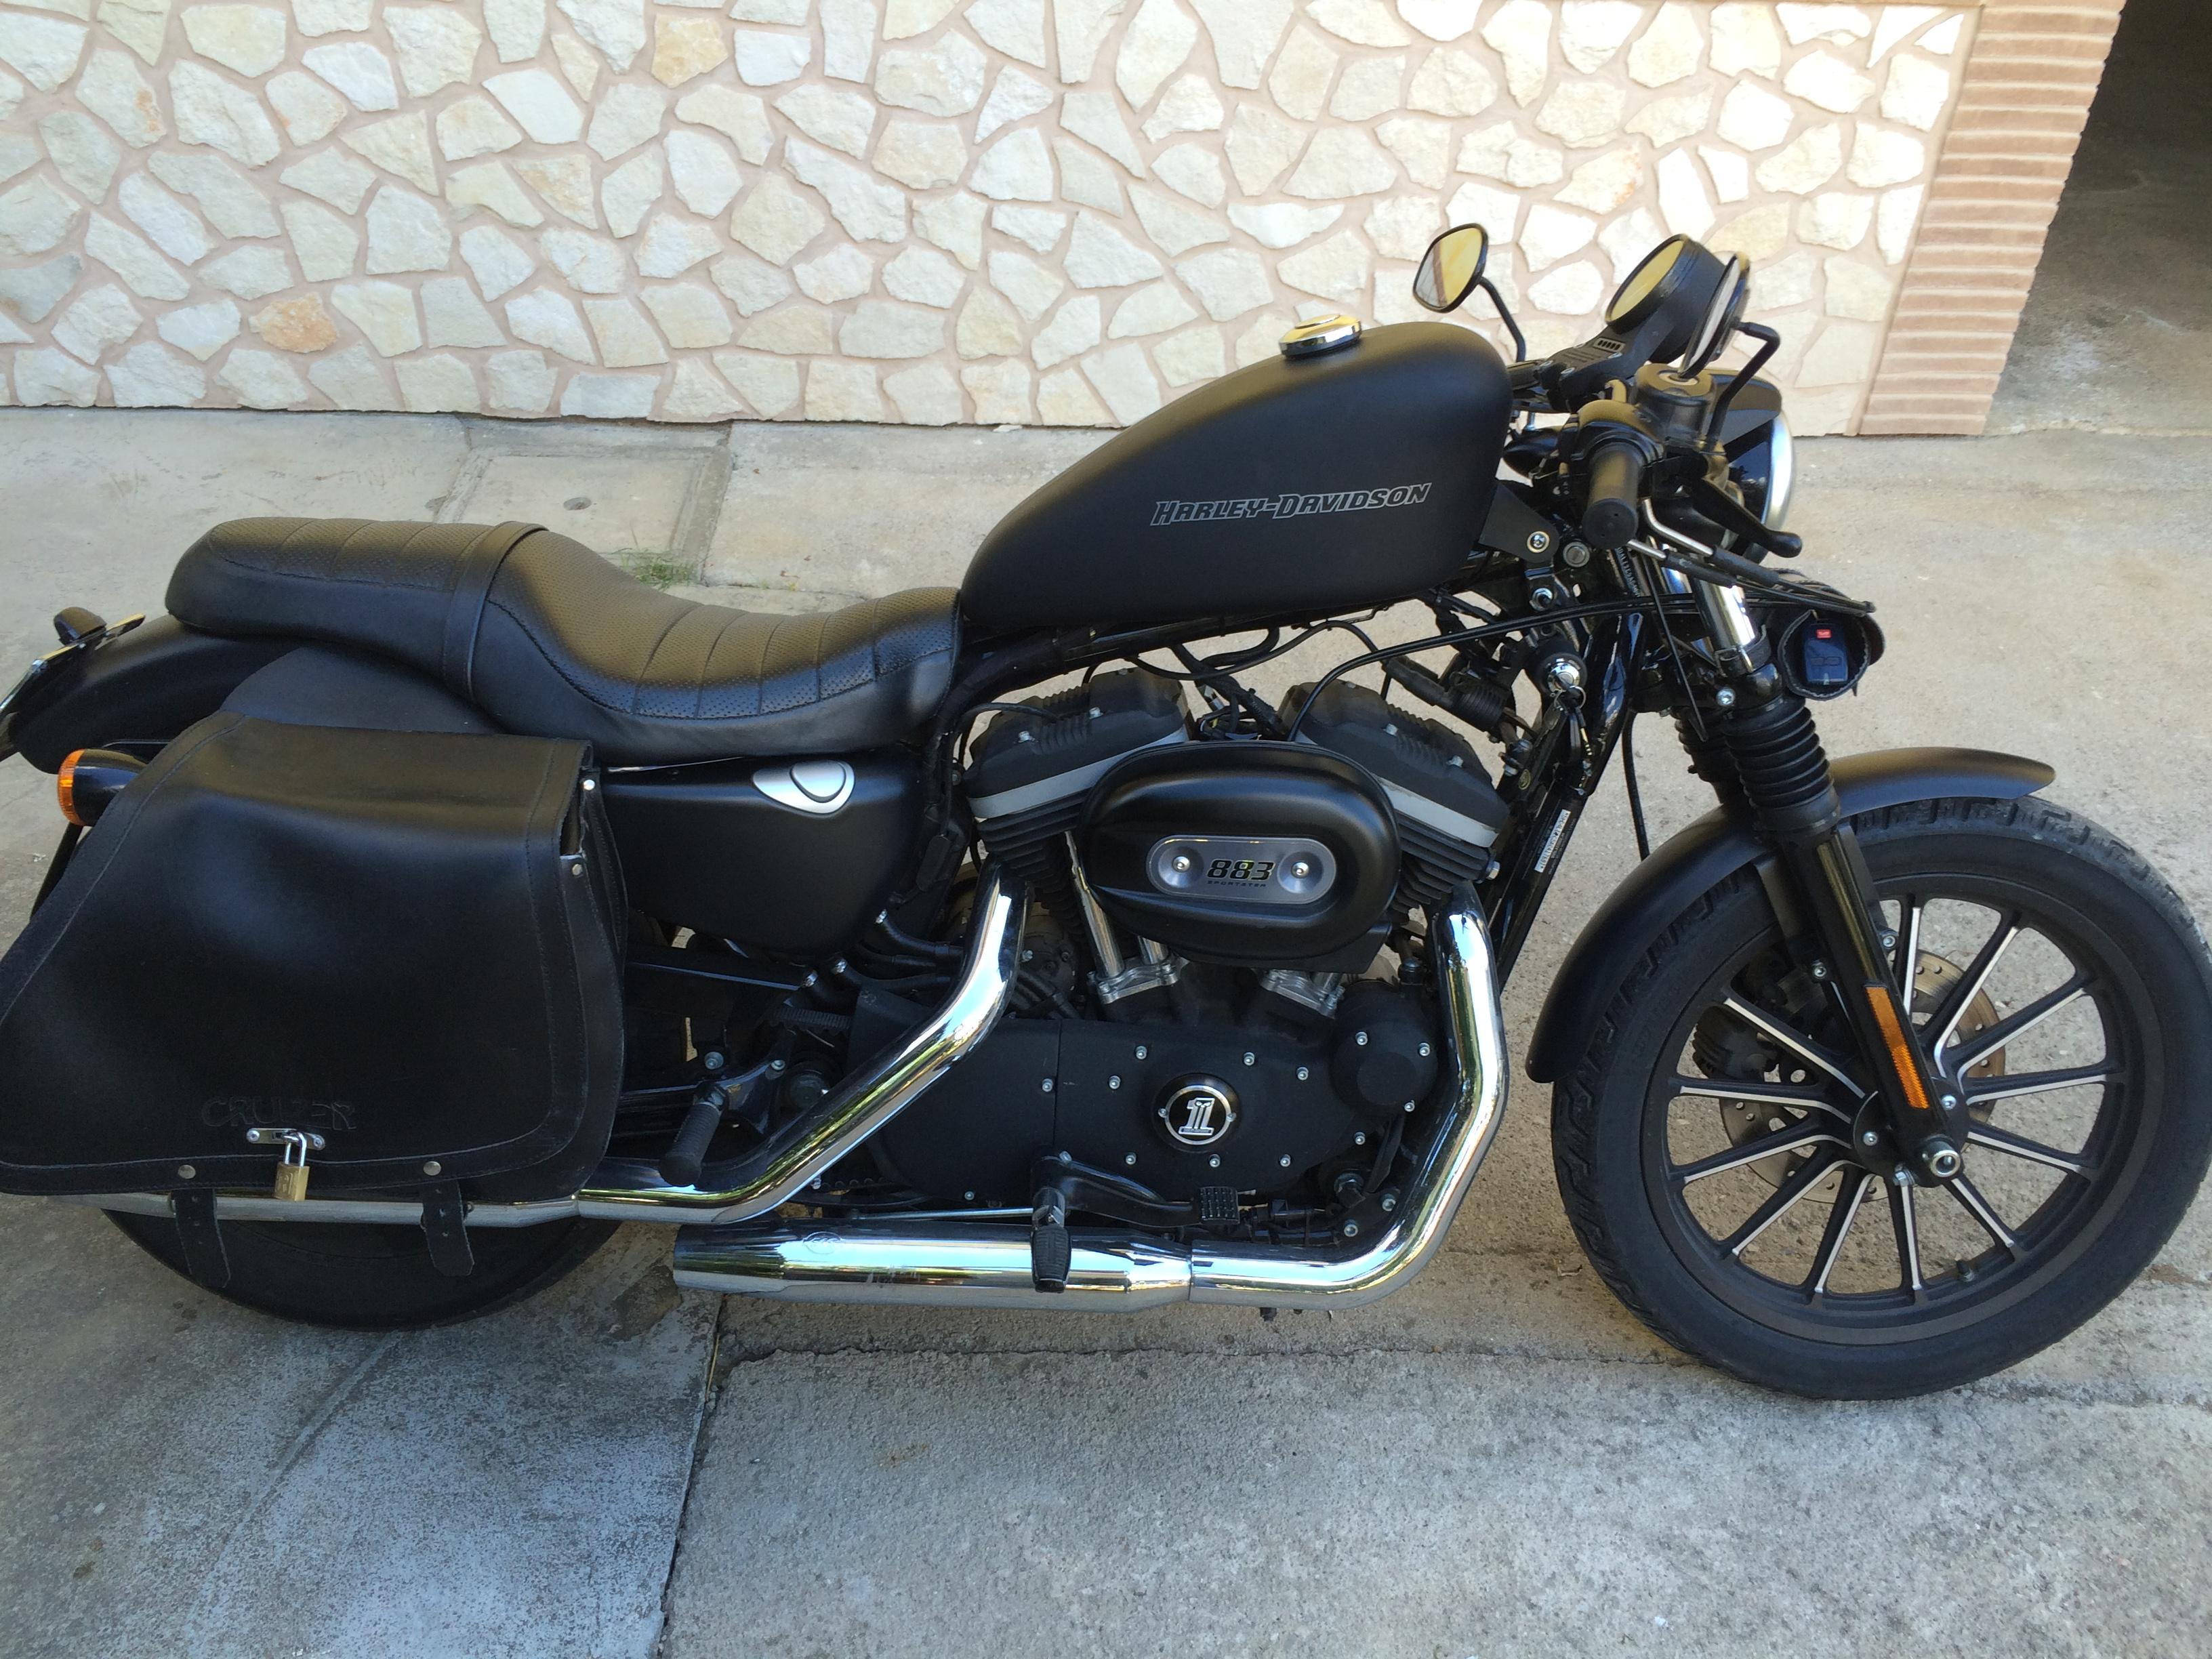 Schema Elettrico Harley Davidson 883 : Annunci vendo harley davidson fondani